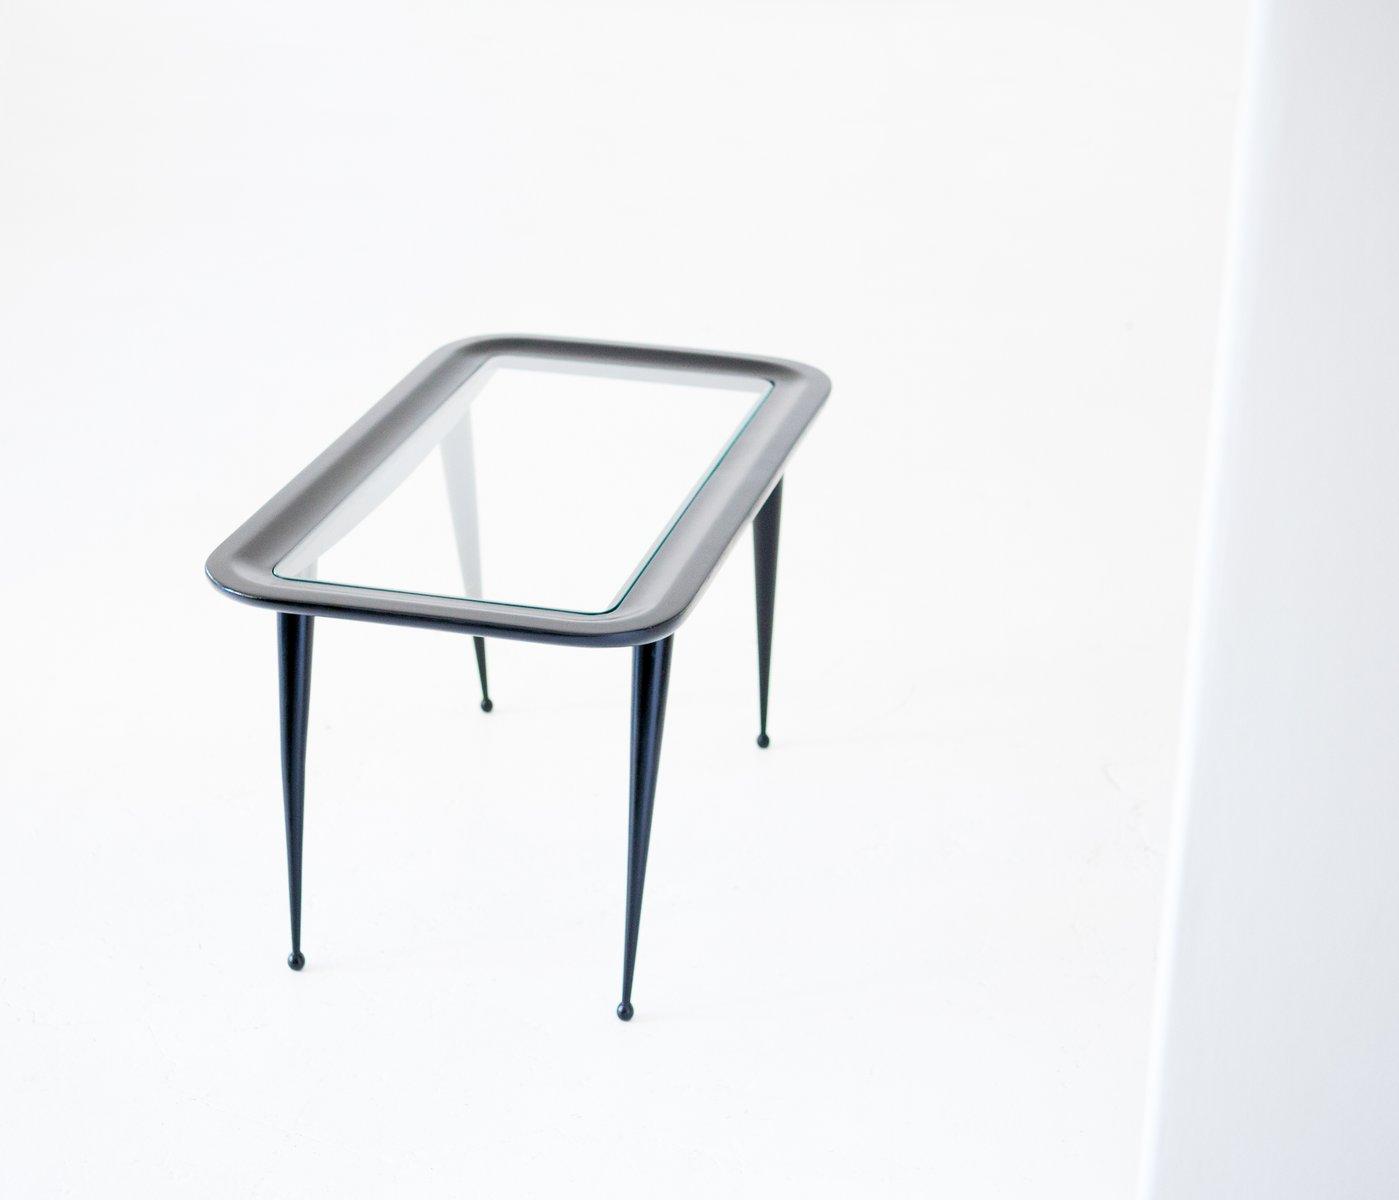 couchtisch aus lackiertem holz mit platte aus glas 1950er. Black Bedroom Furniture Sets. Home Design Ideas